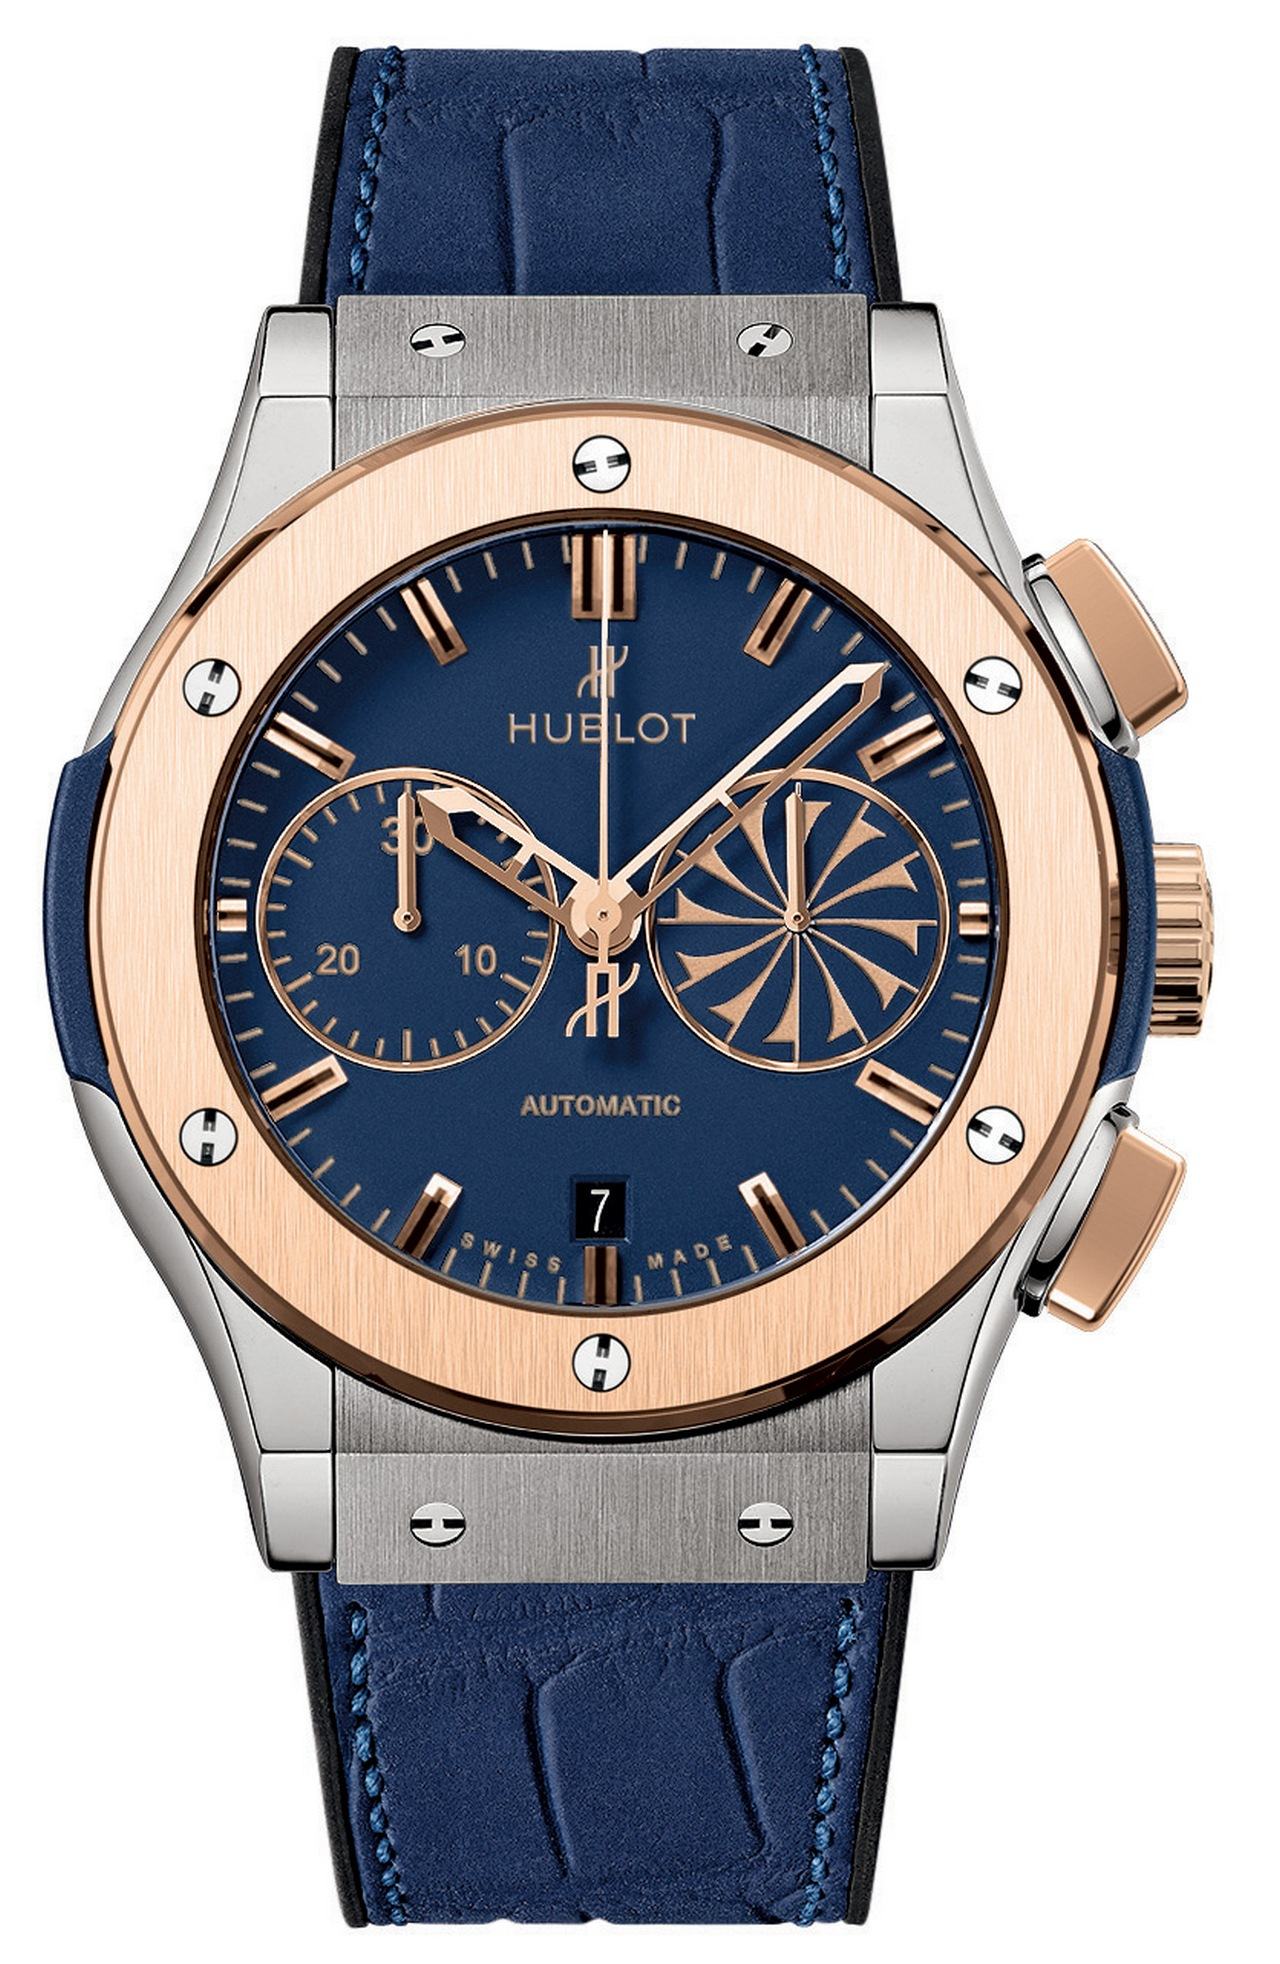 hublot-cronografo-classic-fusion-mykonos-2013_0-100_6